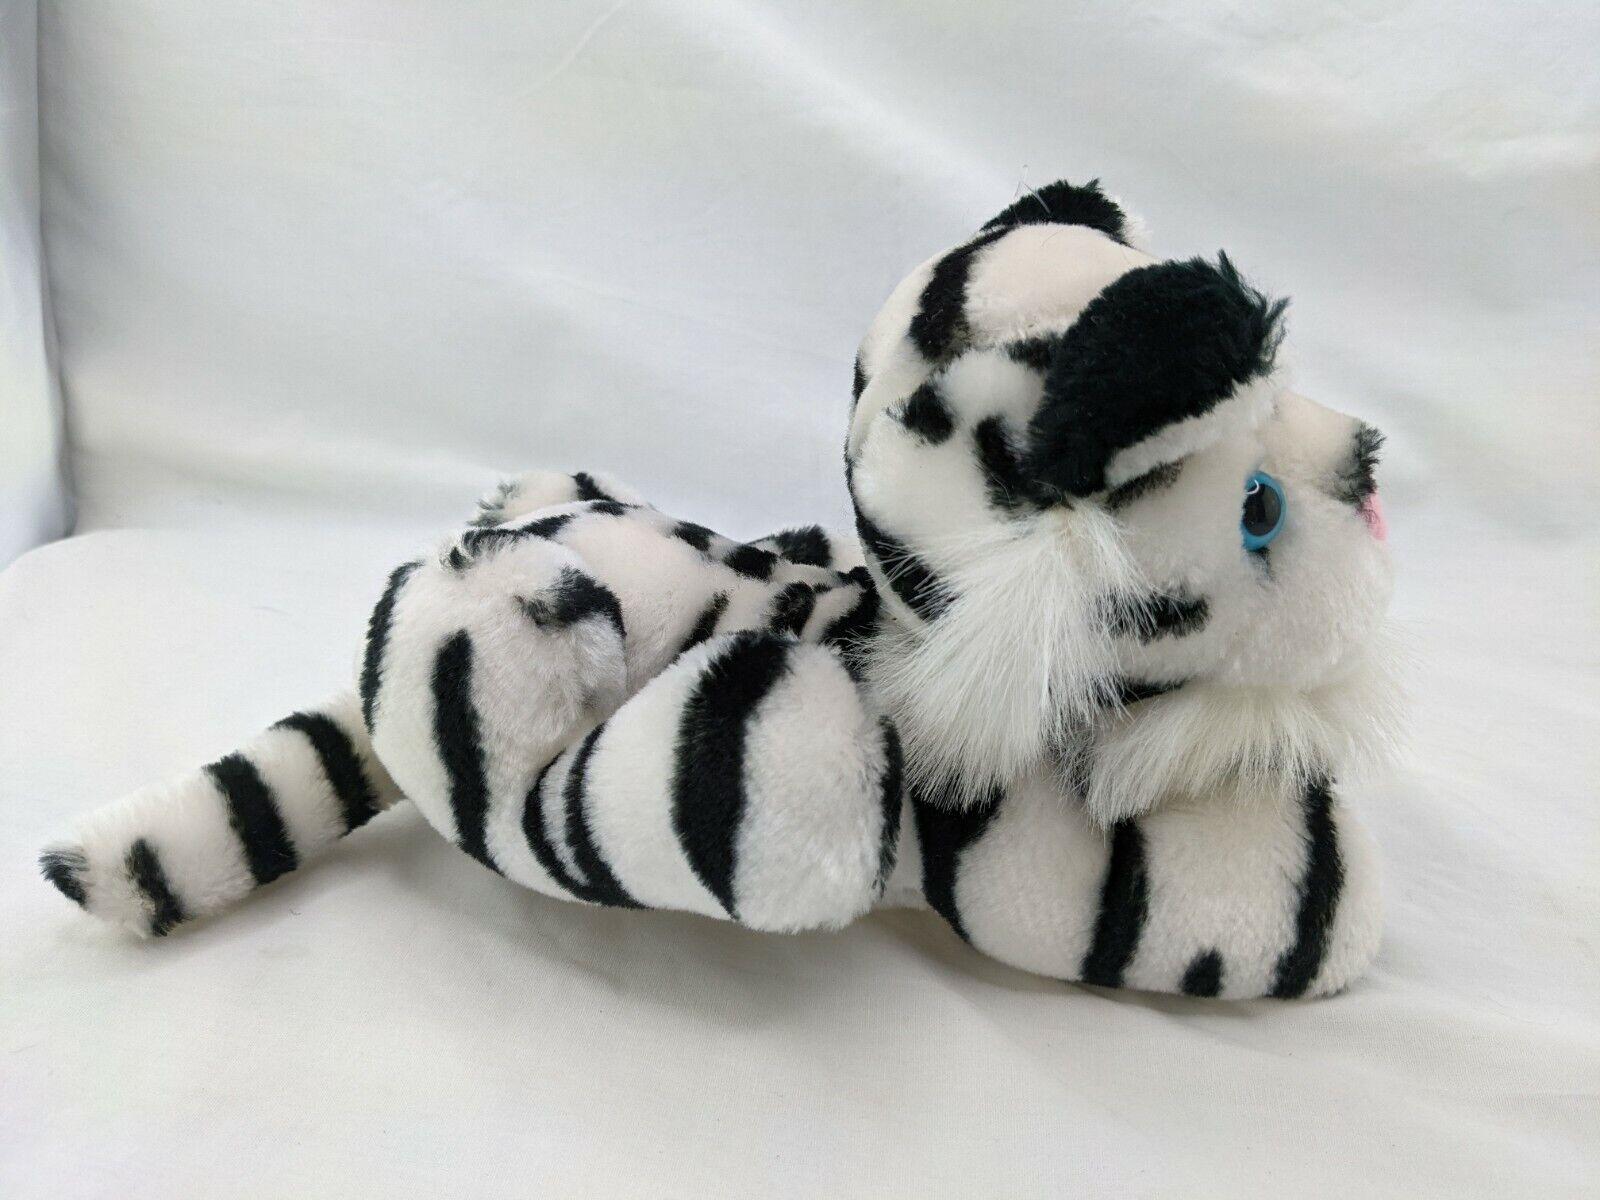 Ringling Bros Siberian Tiger Plush 8 Barnum Bailey Stuffed Animal Toy - $11.66